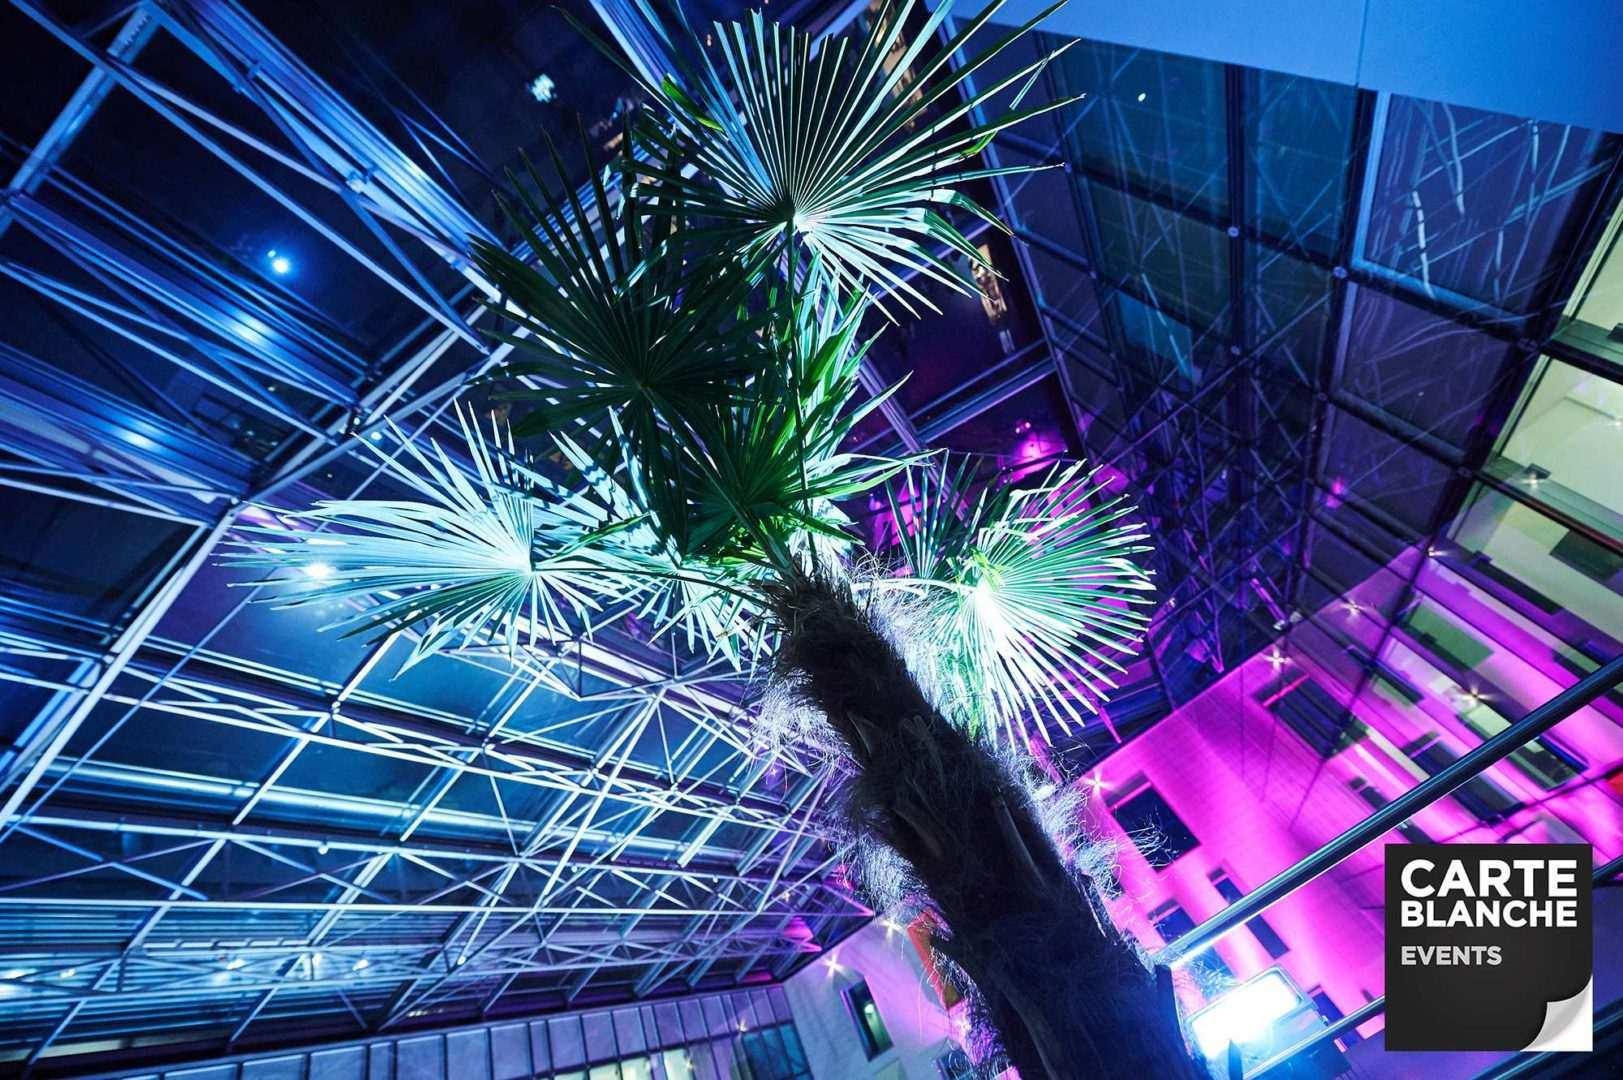 xmas-degroof-petercam-2015-039-luxembourg-event